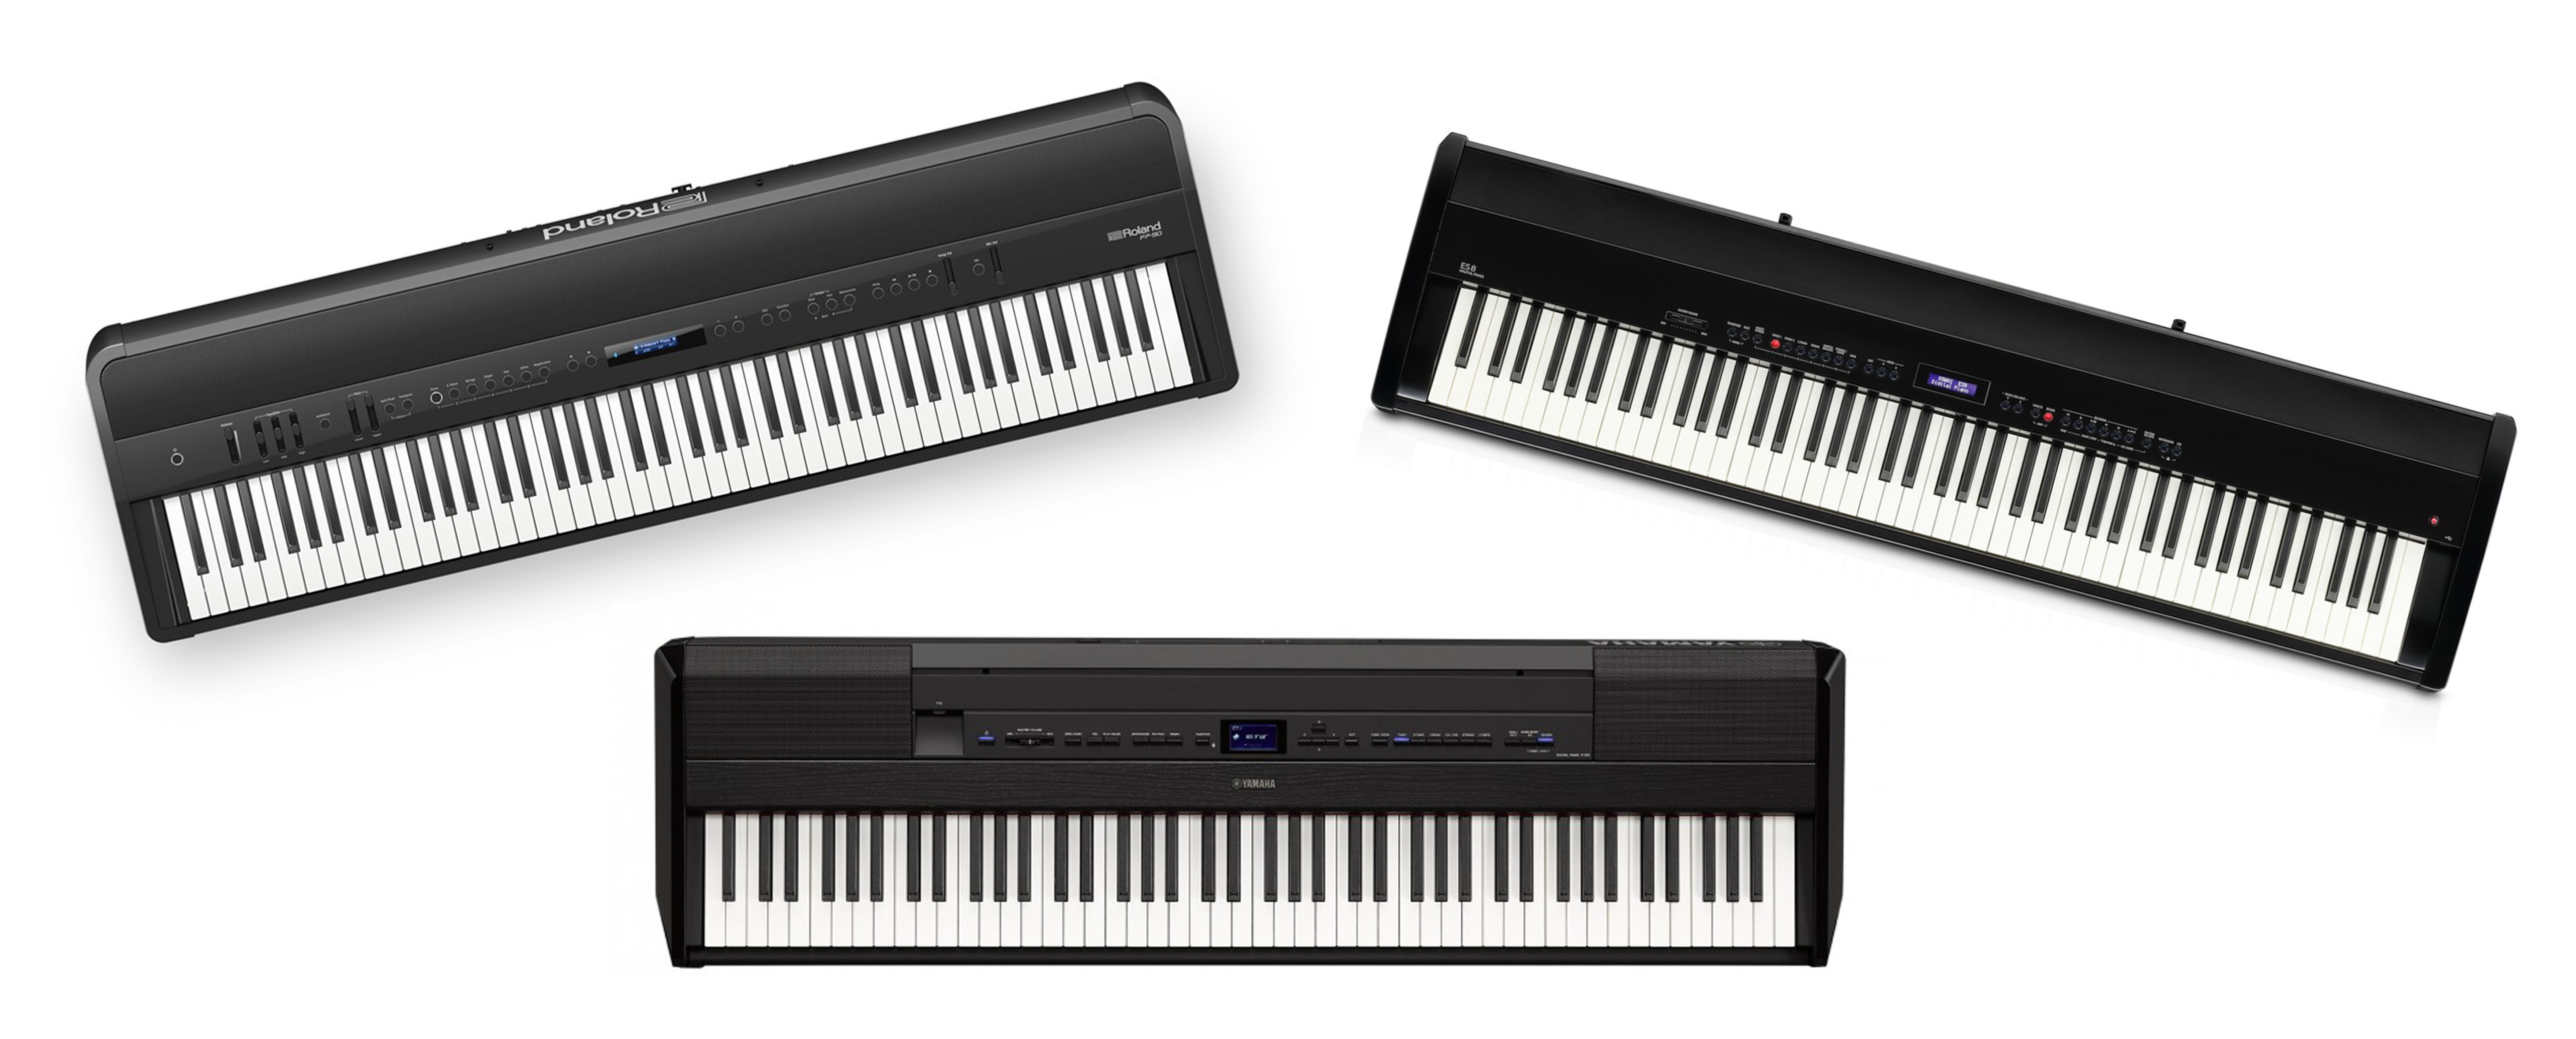 Roland FP-90, Yamaha P-515 ja Kawai ES-8: keikkapianovertailu